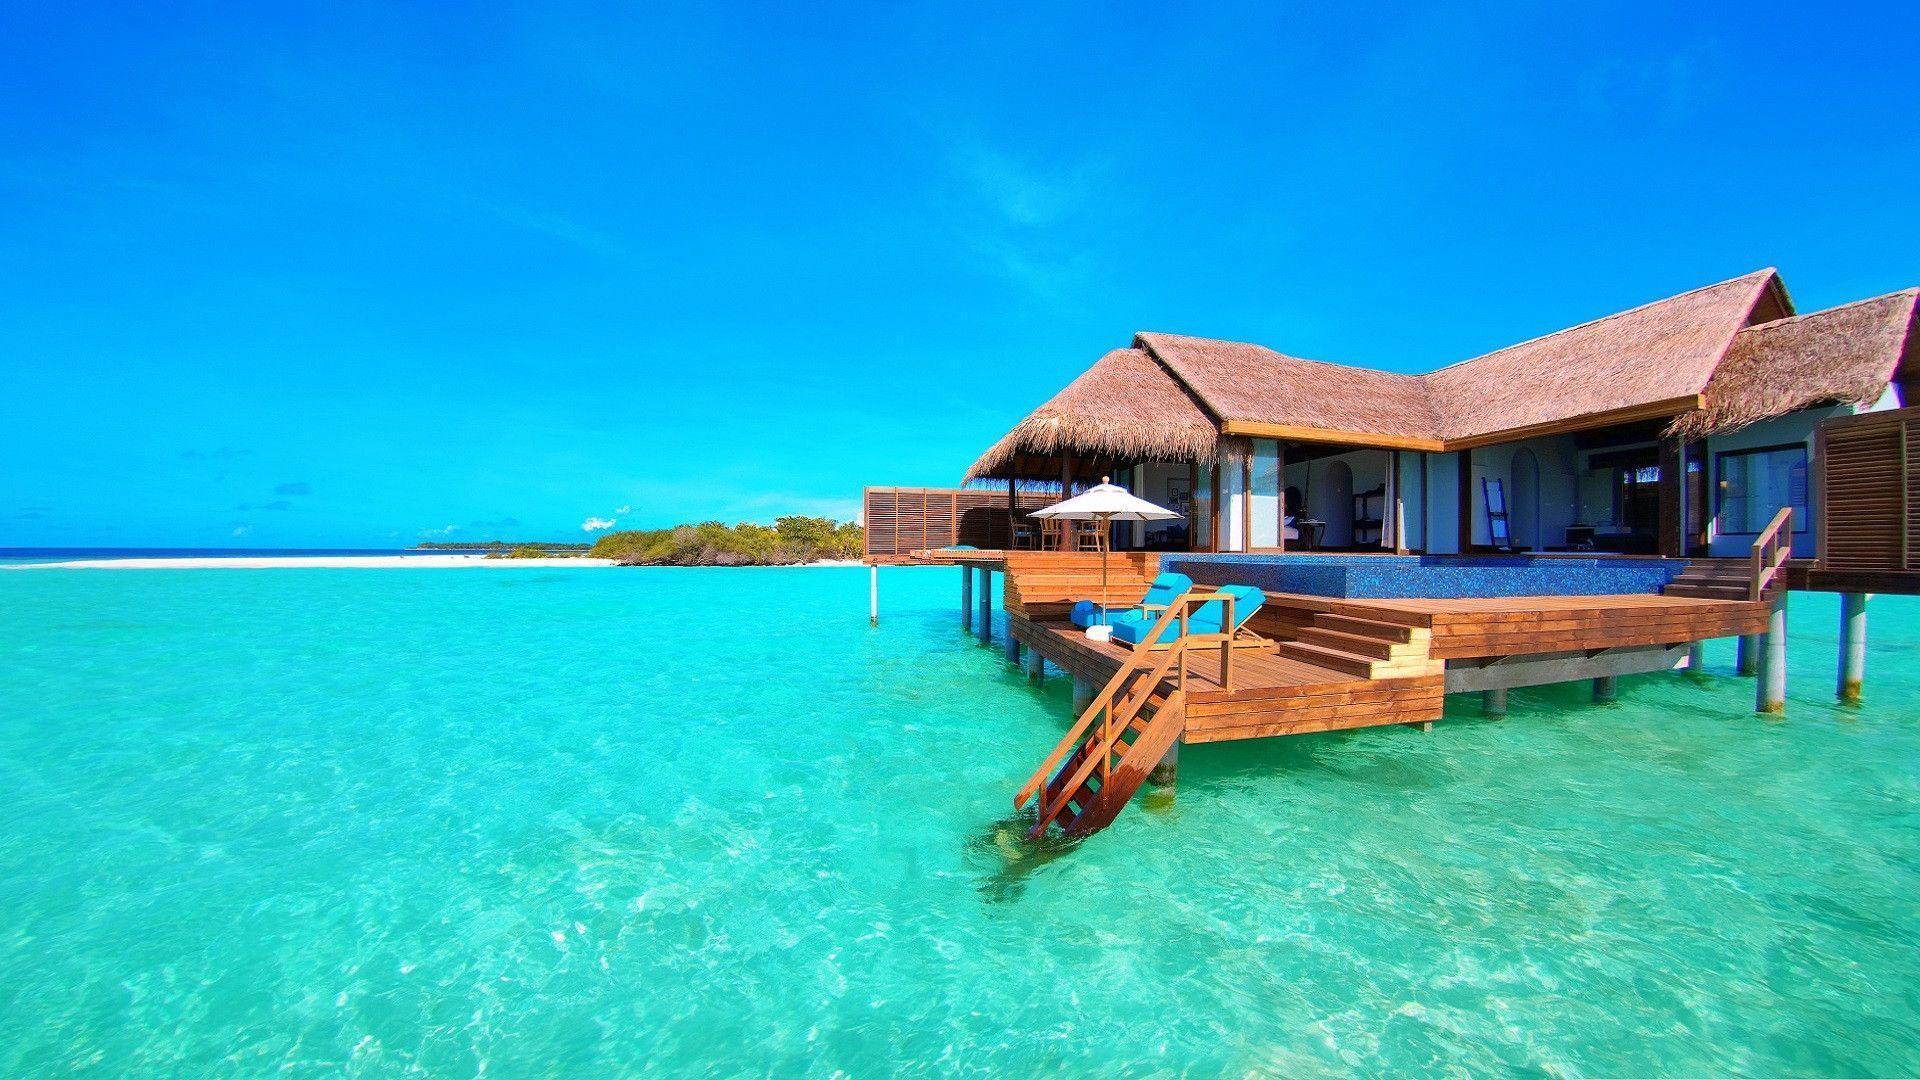 Hd Tropical Island Beach Paradise Wallpapers And Backgrounds: Tropical Island Backgrounds